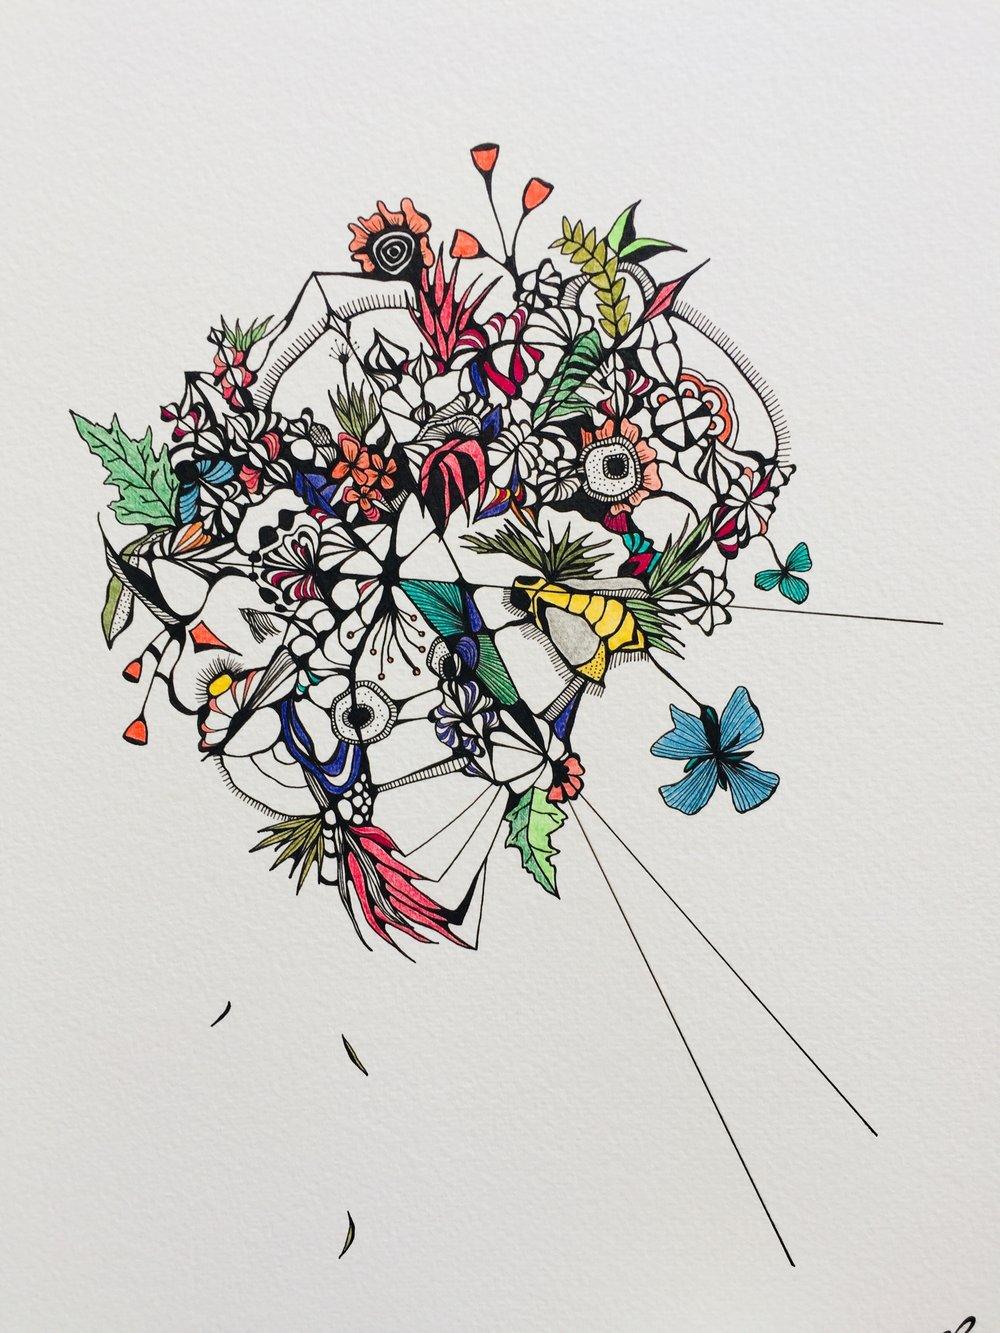 Hazy Blooms by Chantel Schott